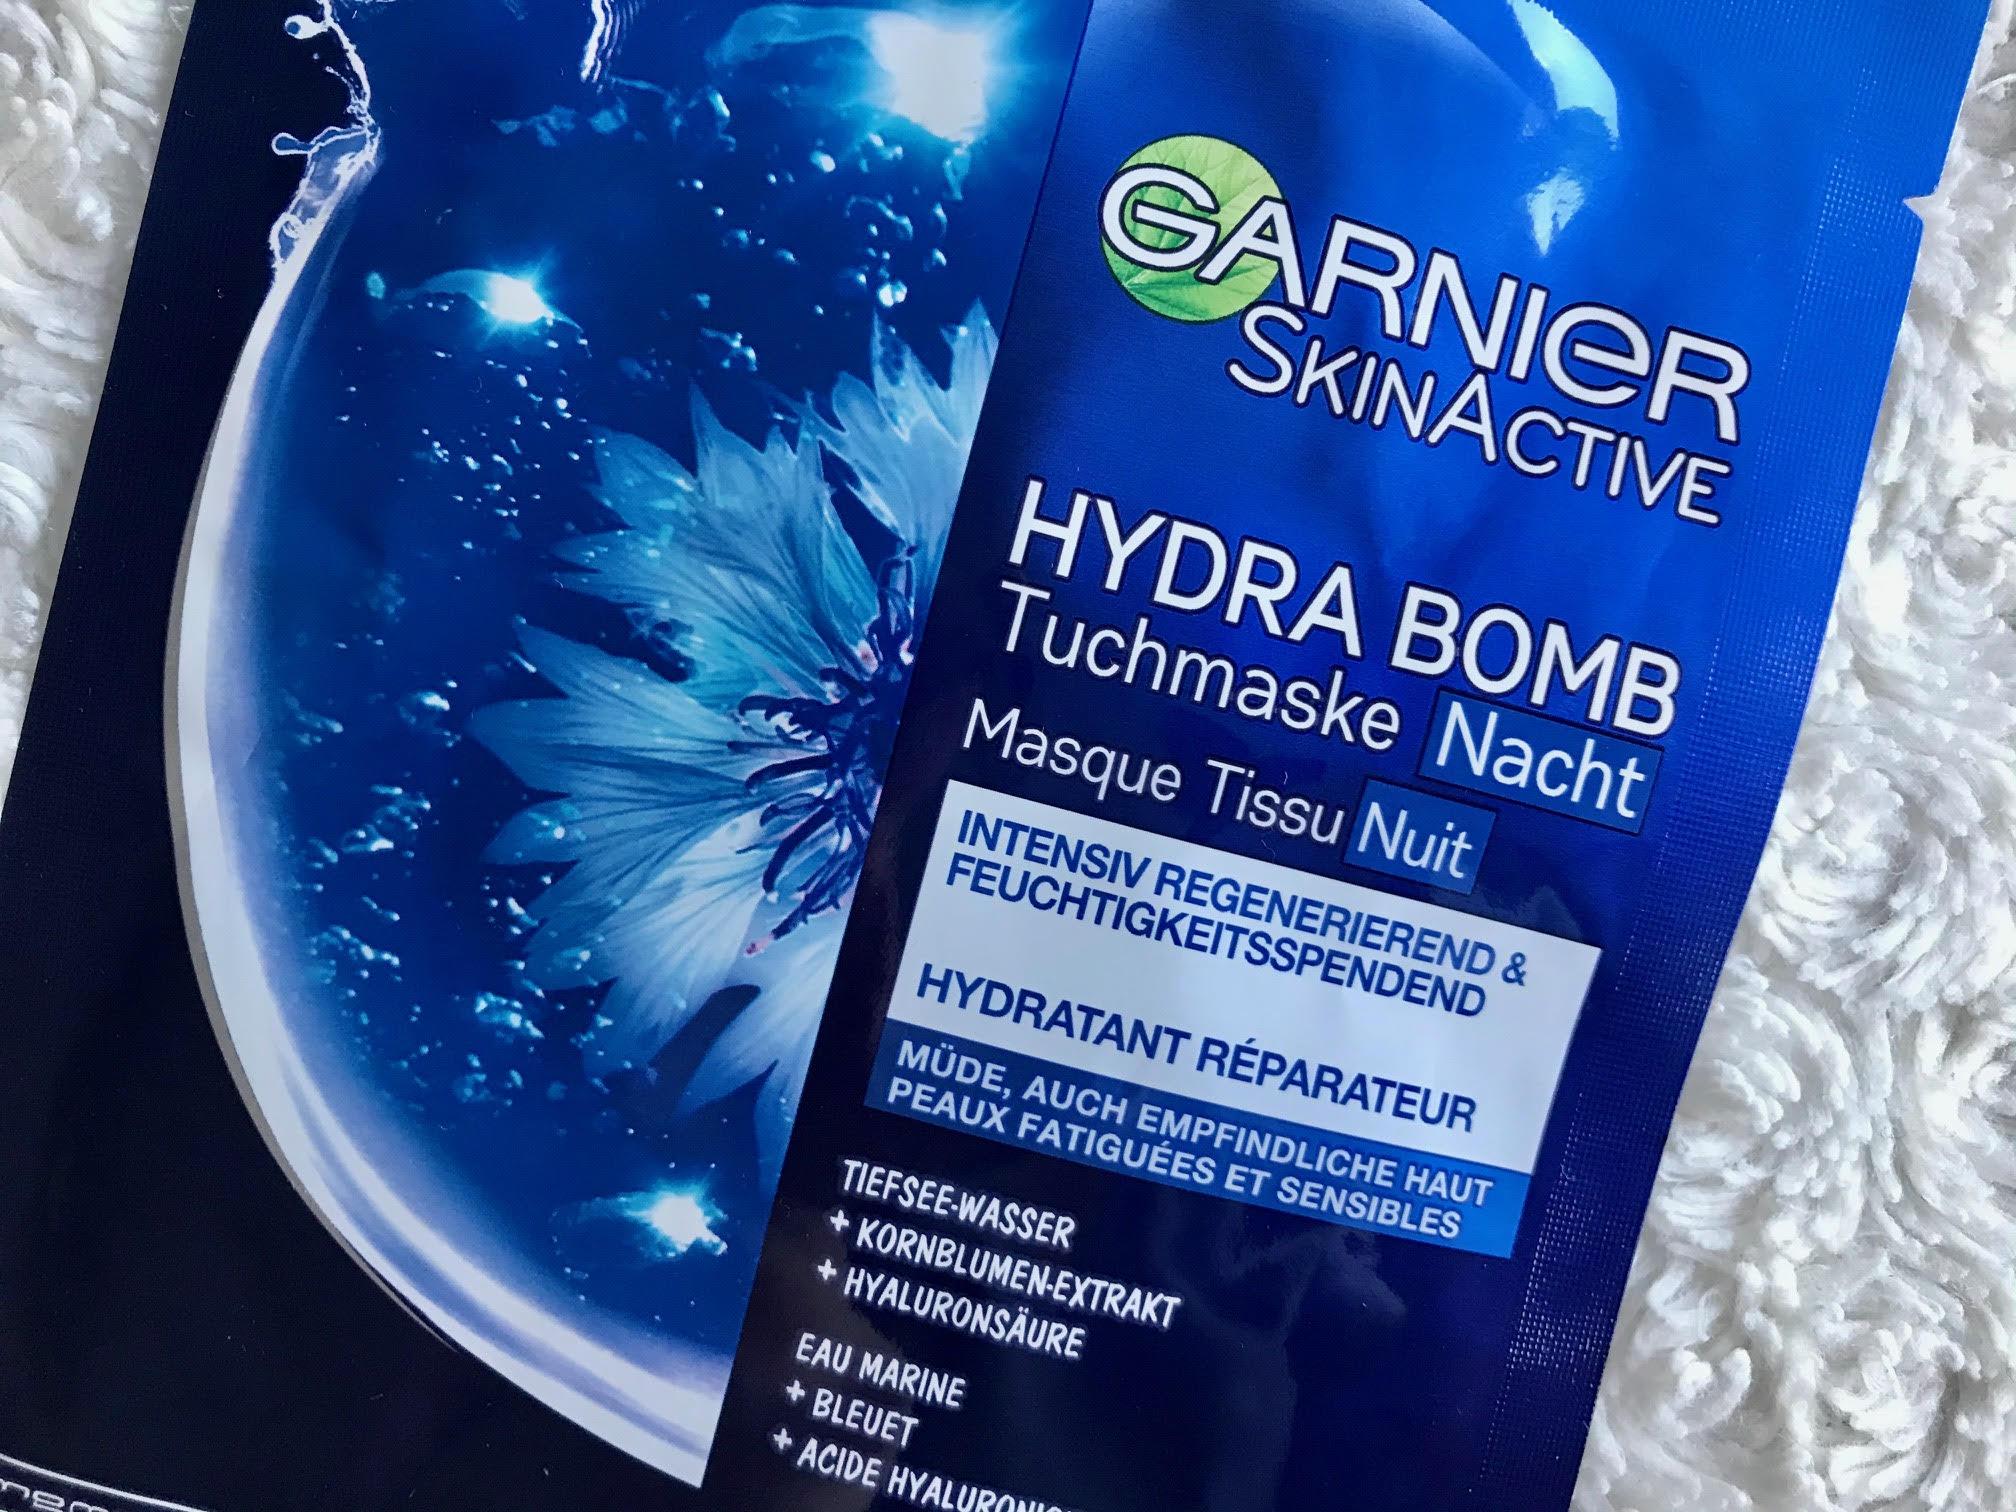 garnier hydra bomb mask